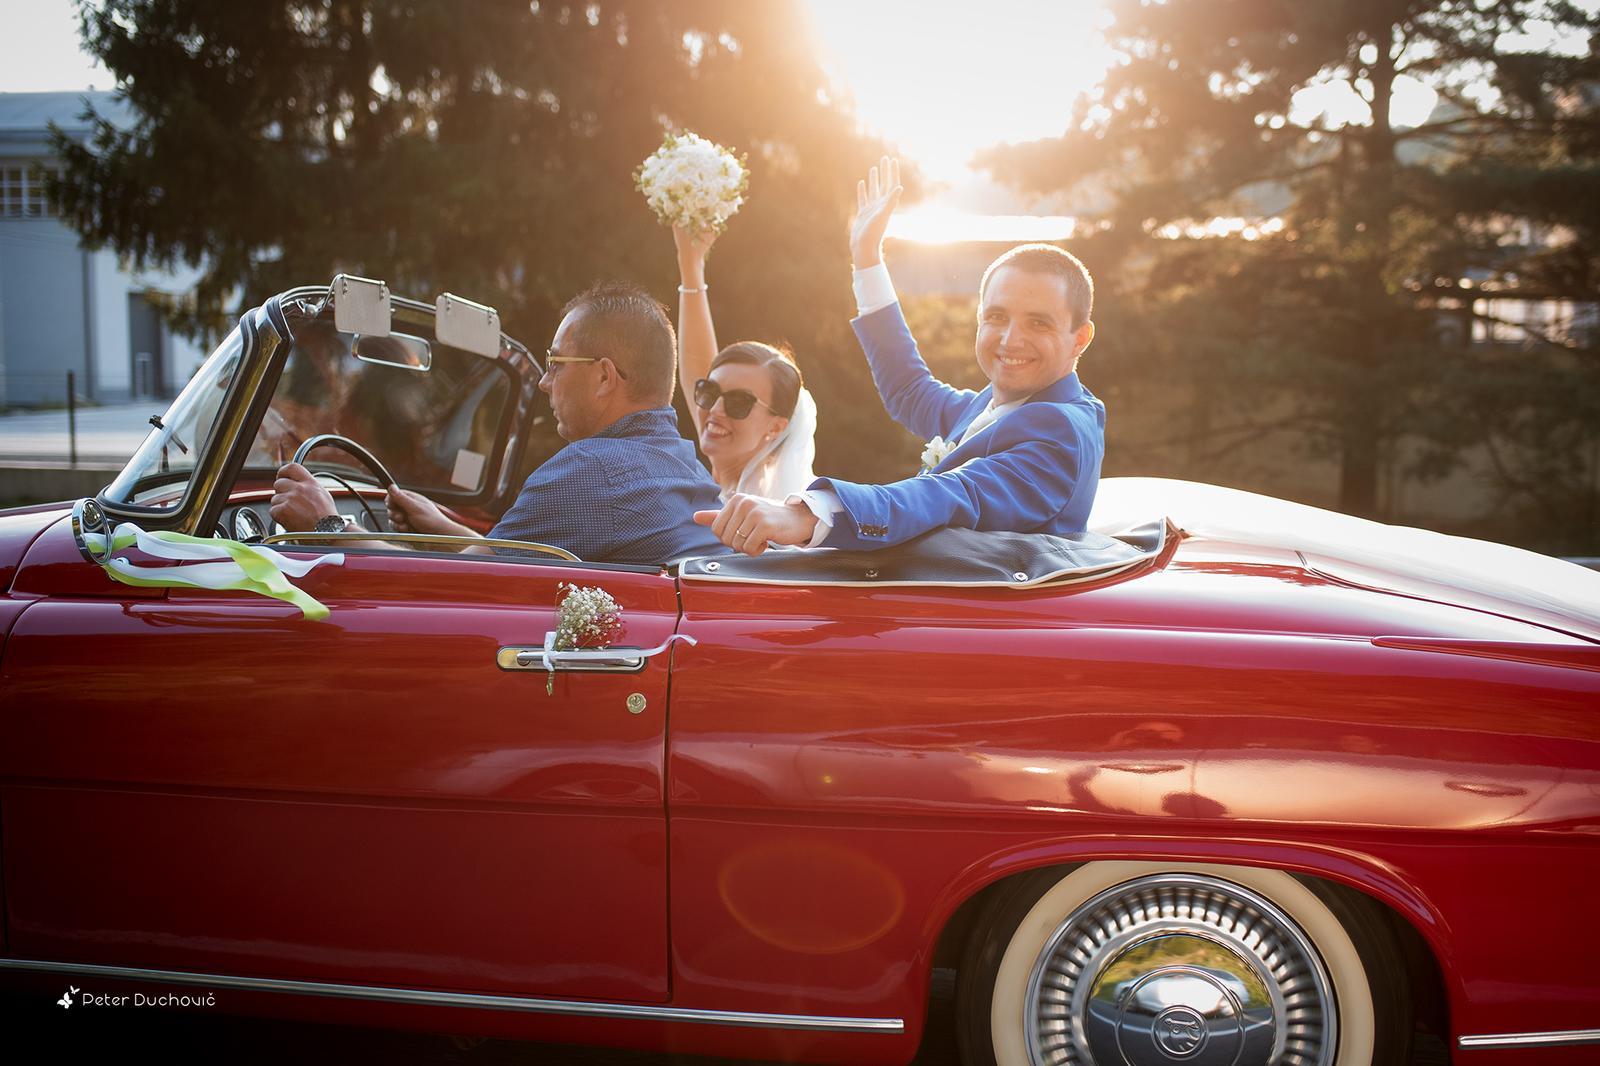 Svadba Lucia a Peter - cestou na hostinu :)